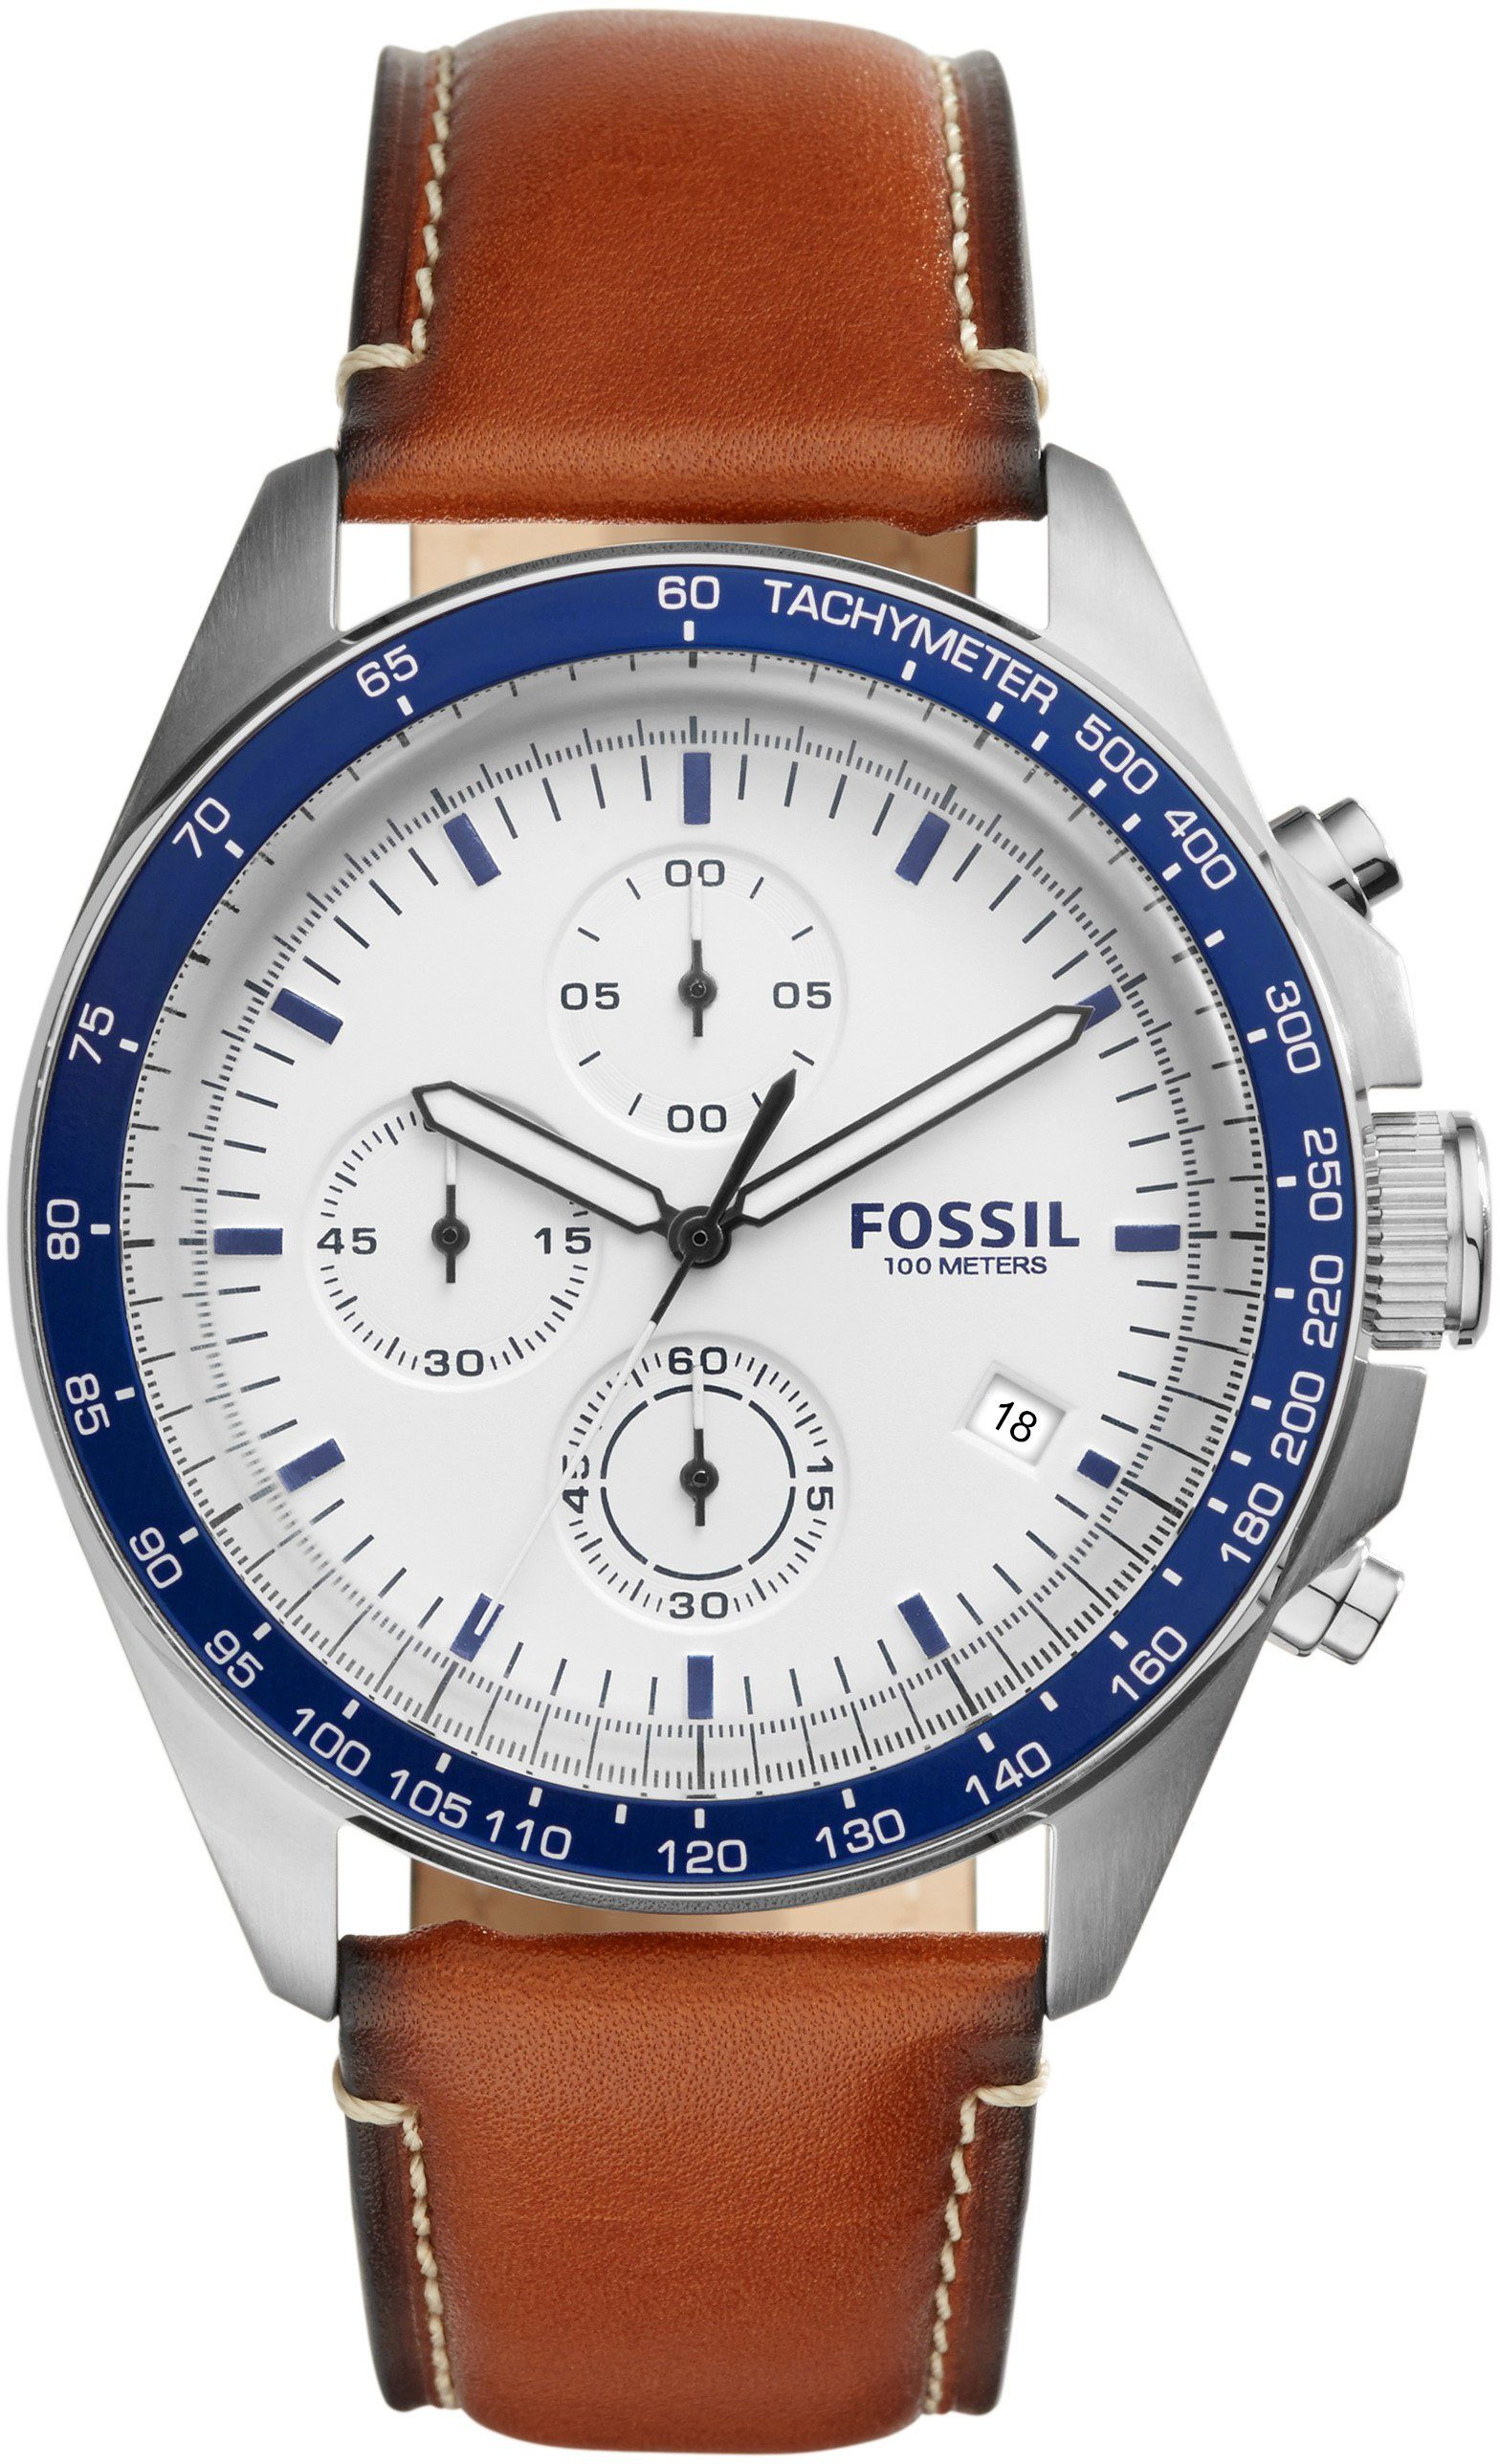 Fossil Chronograph »Sport 54, CH3029«